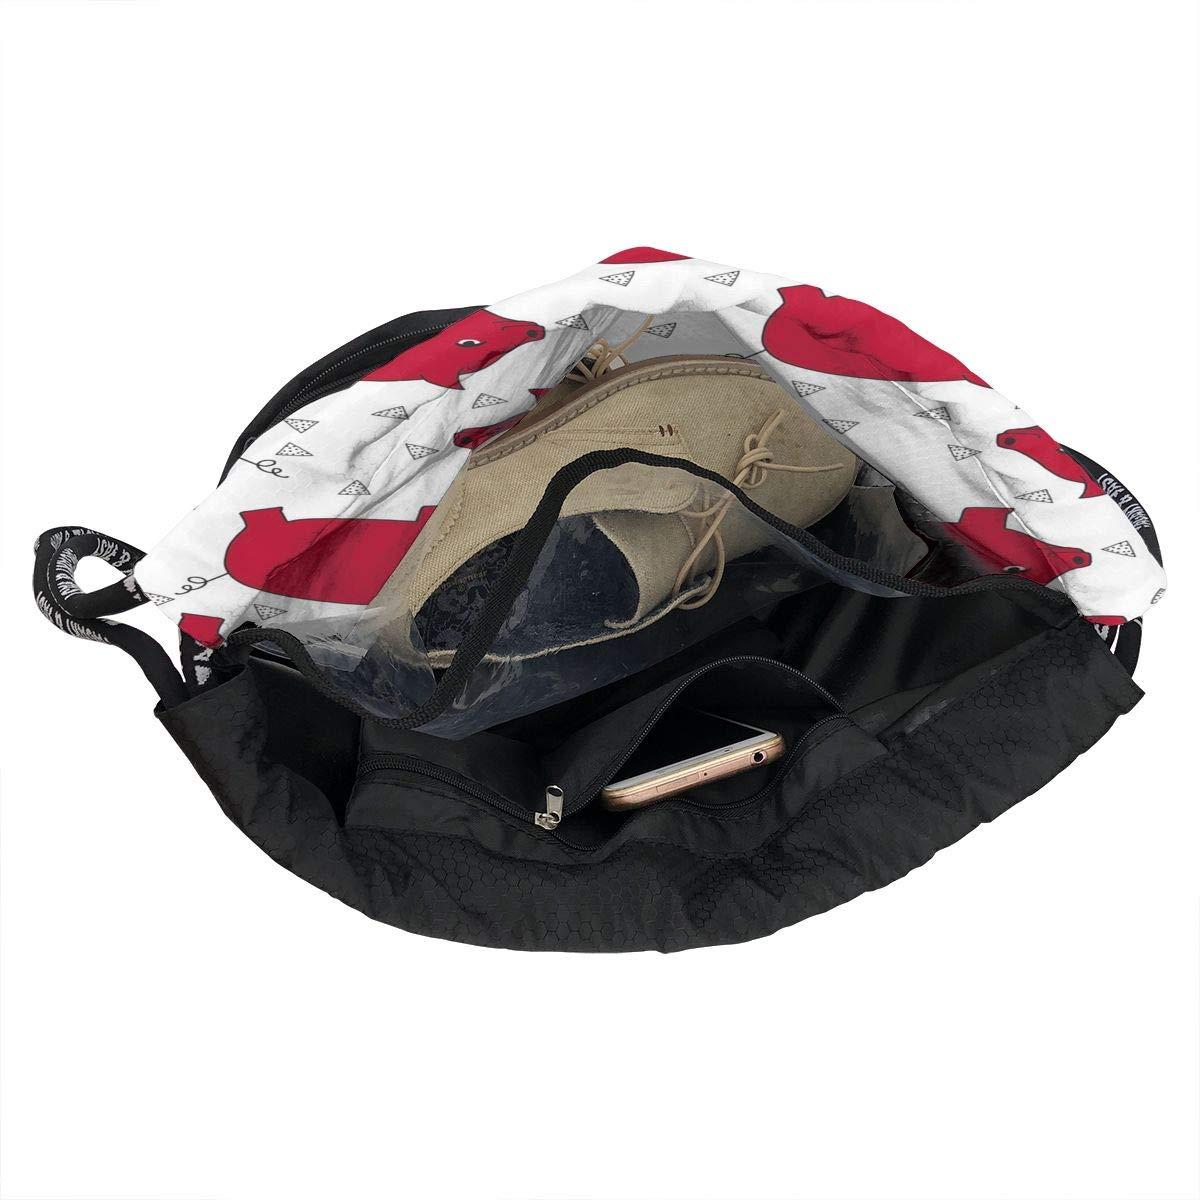 Zol1Q Lightweight Waterproof Large Storage Drawstring Bag for Men /& Women Red Cartoon Pig Cinch Backpack Sackpack Tote Sack